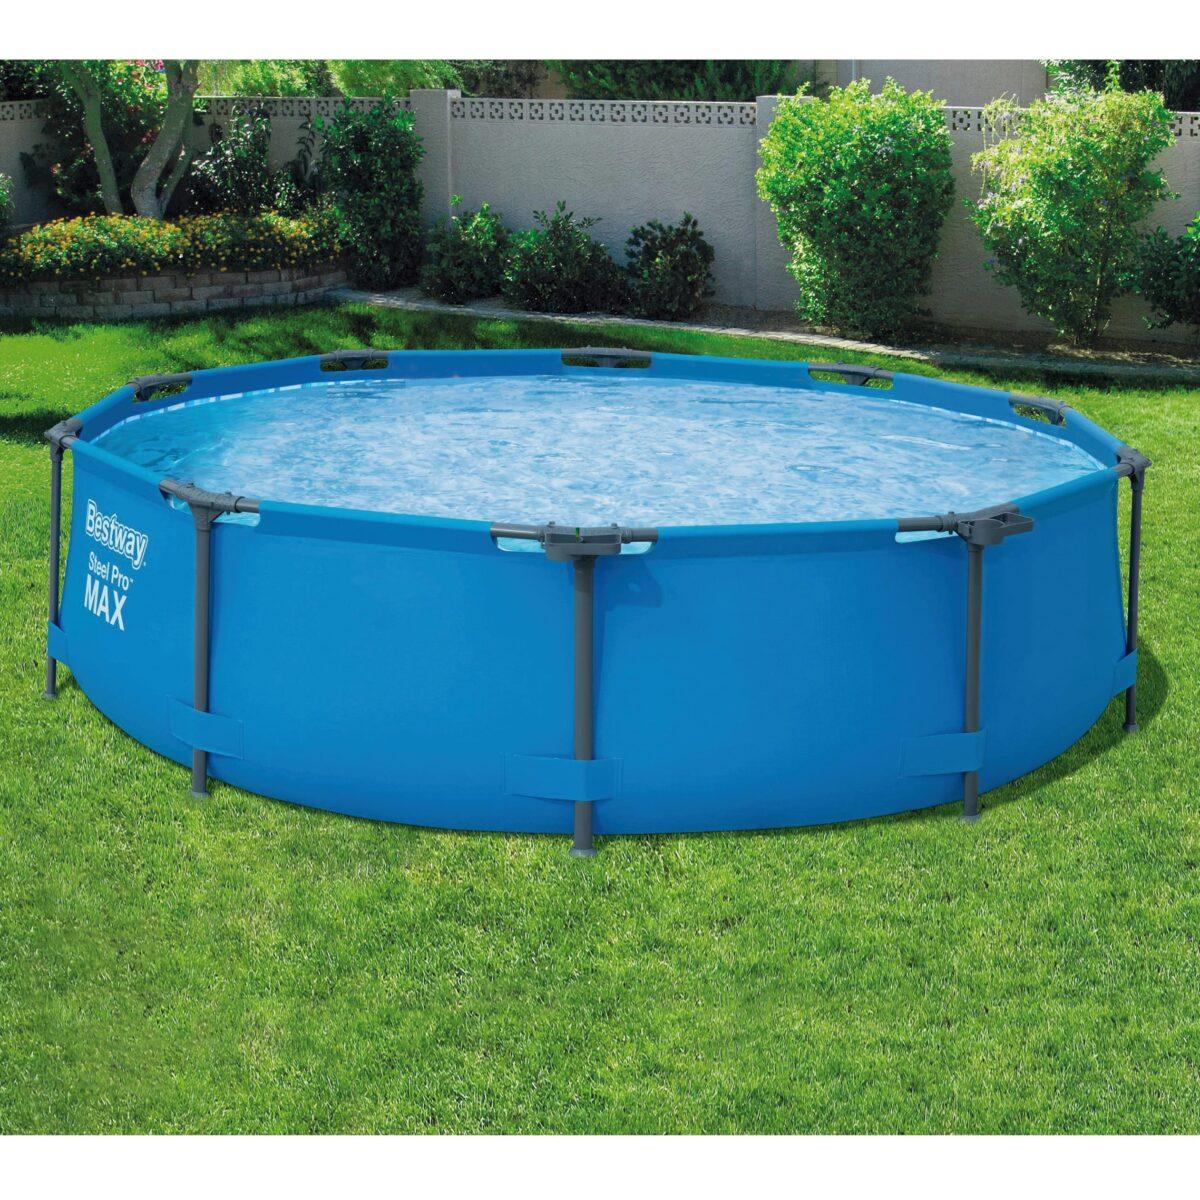 leroy-merlin-piscina-fuori-terra-bestway